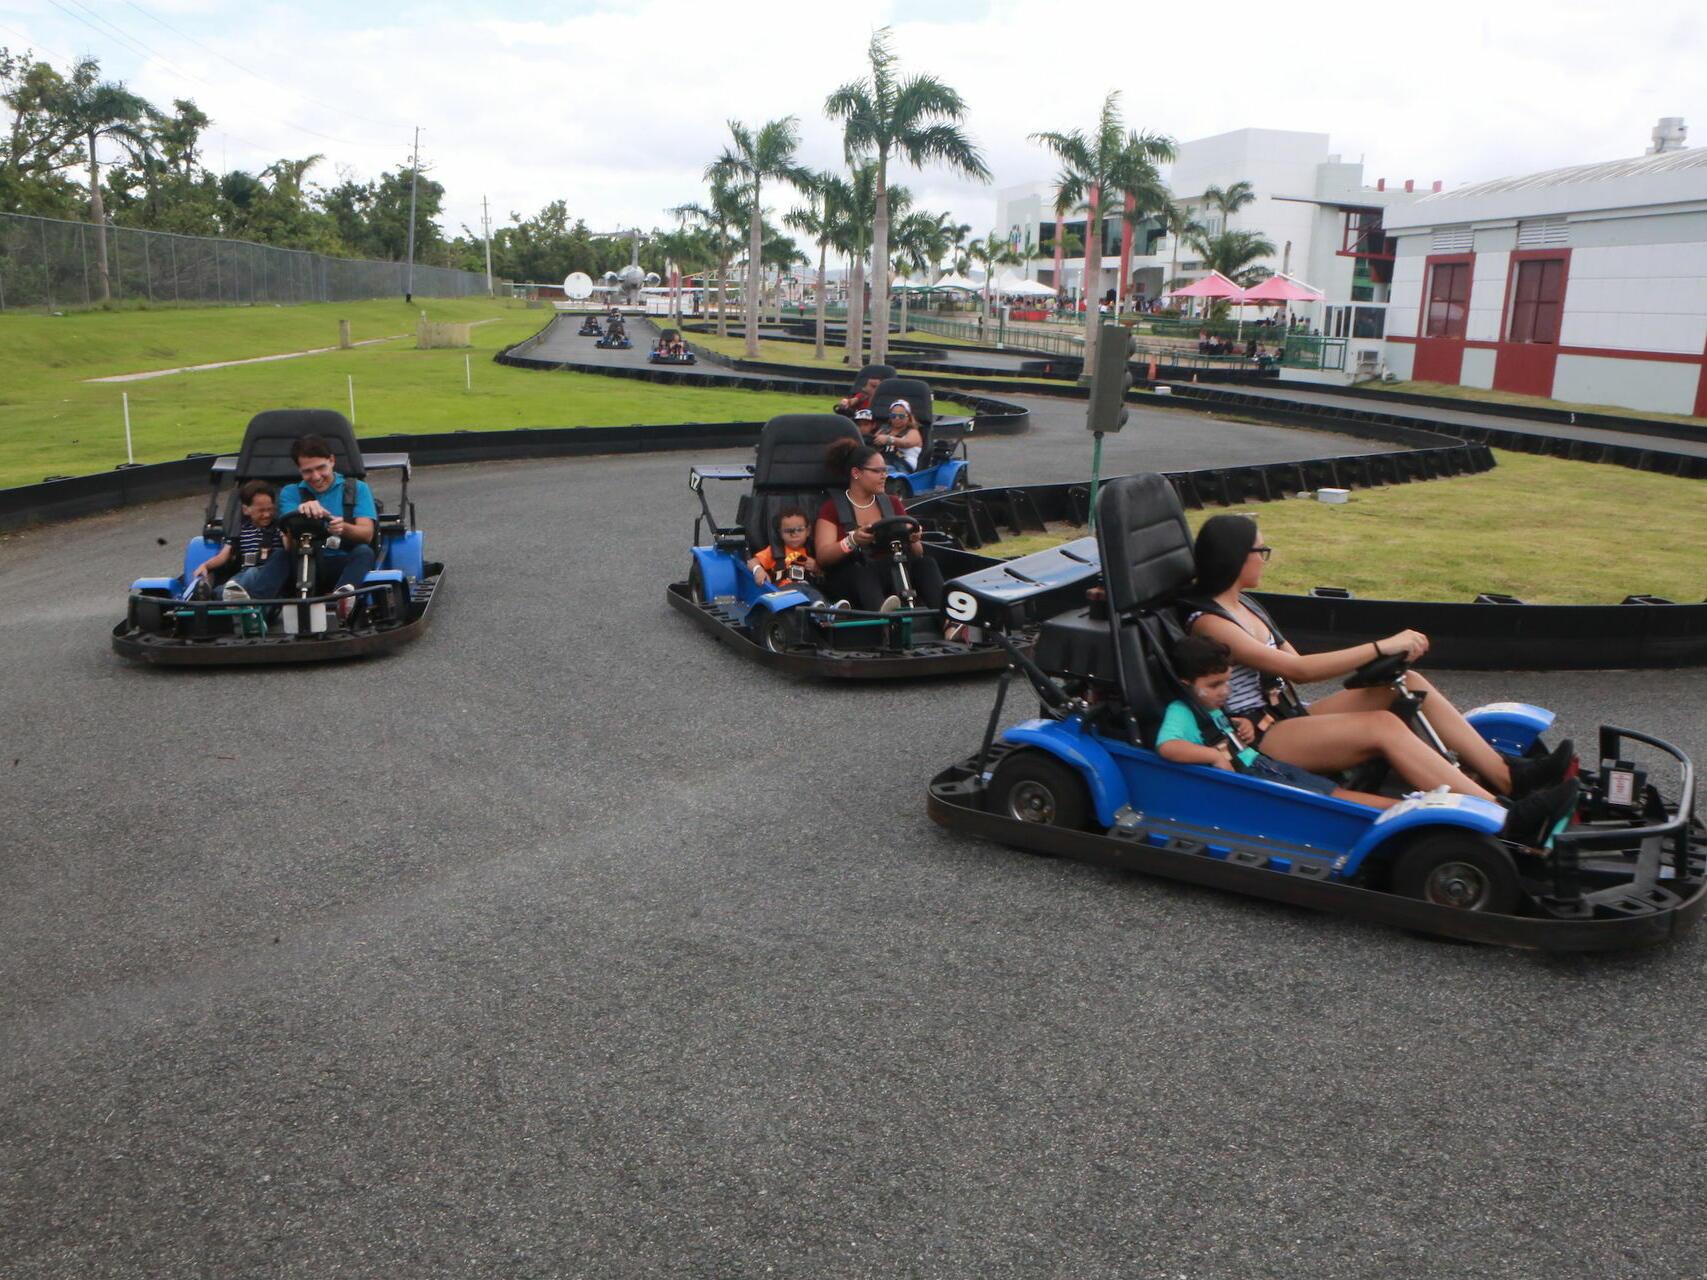 Family driving go-karts